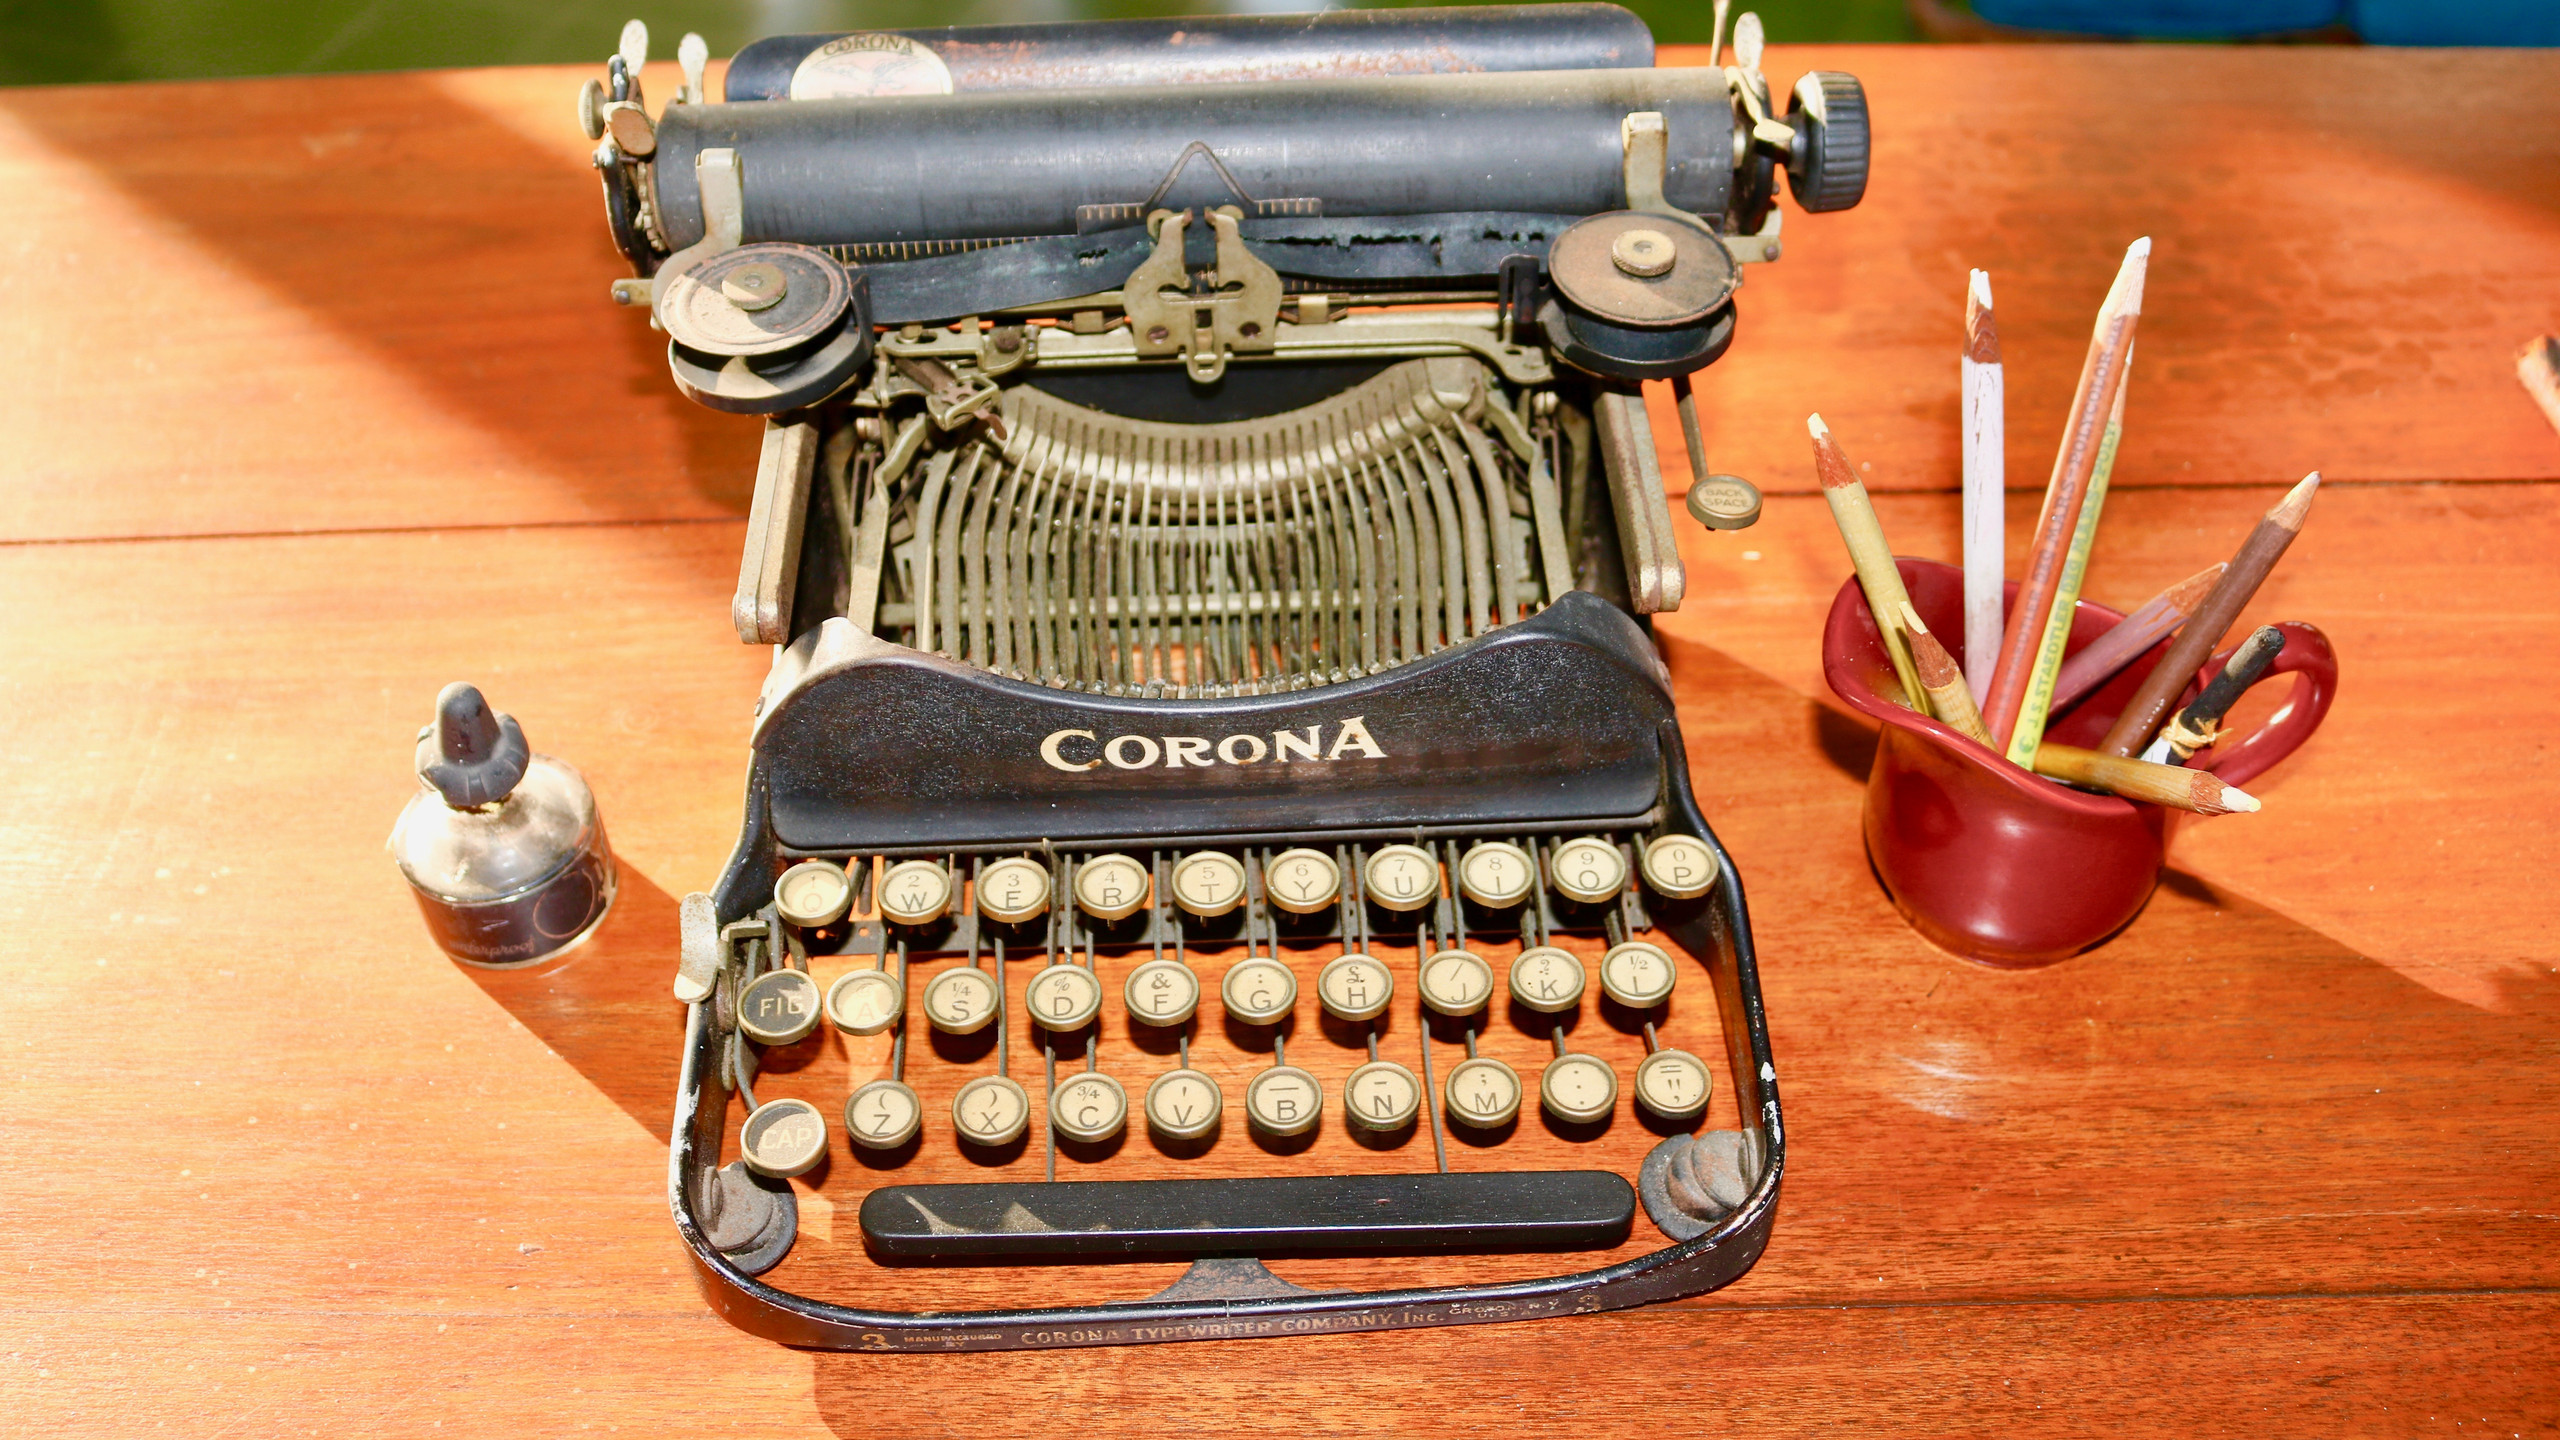 Ernest Hemingway's typewriter on his desk at Finca Vigia in Cuba.